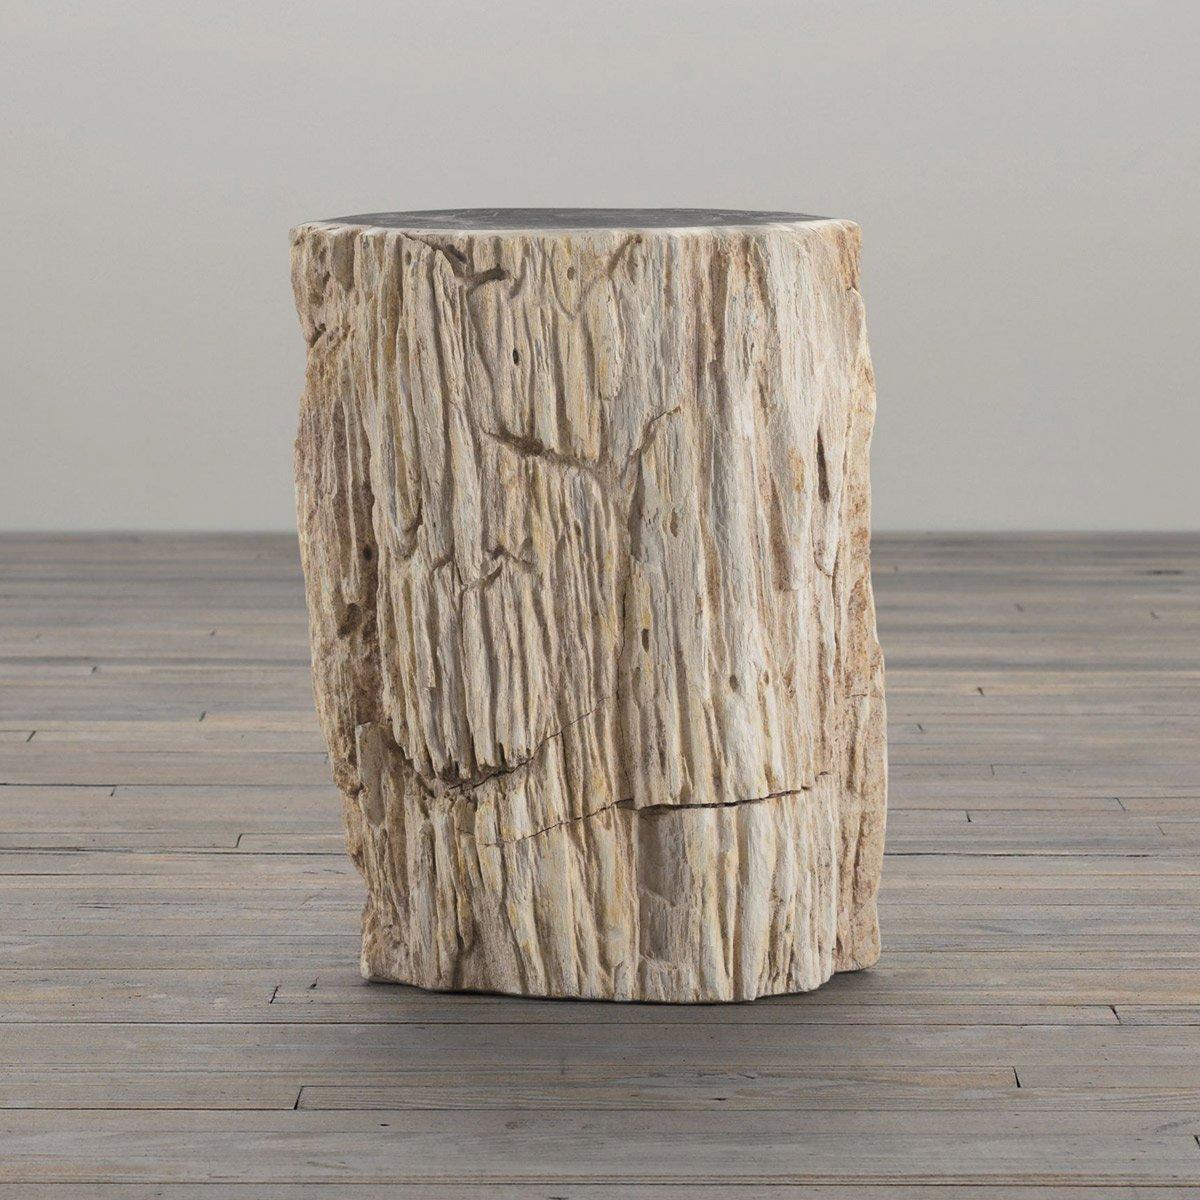 petrified wood stump table